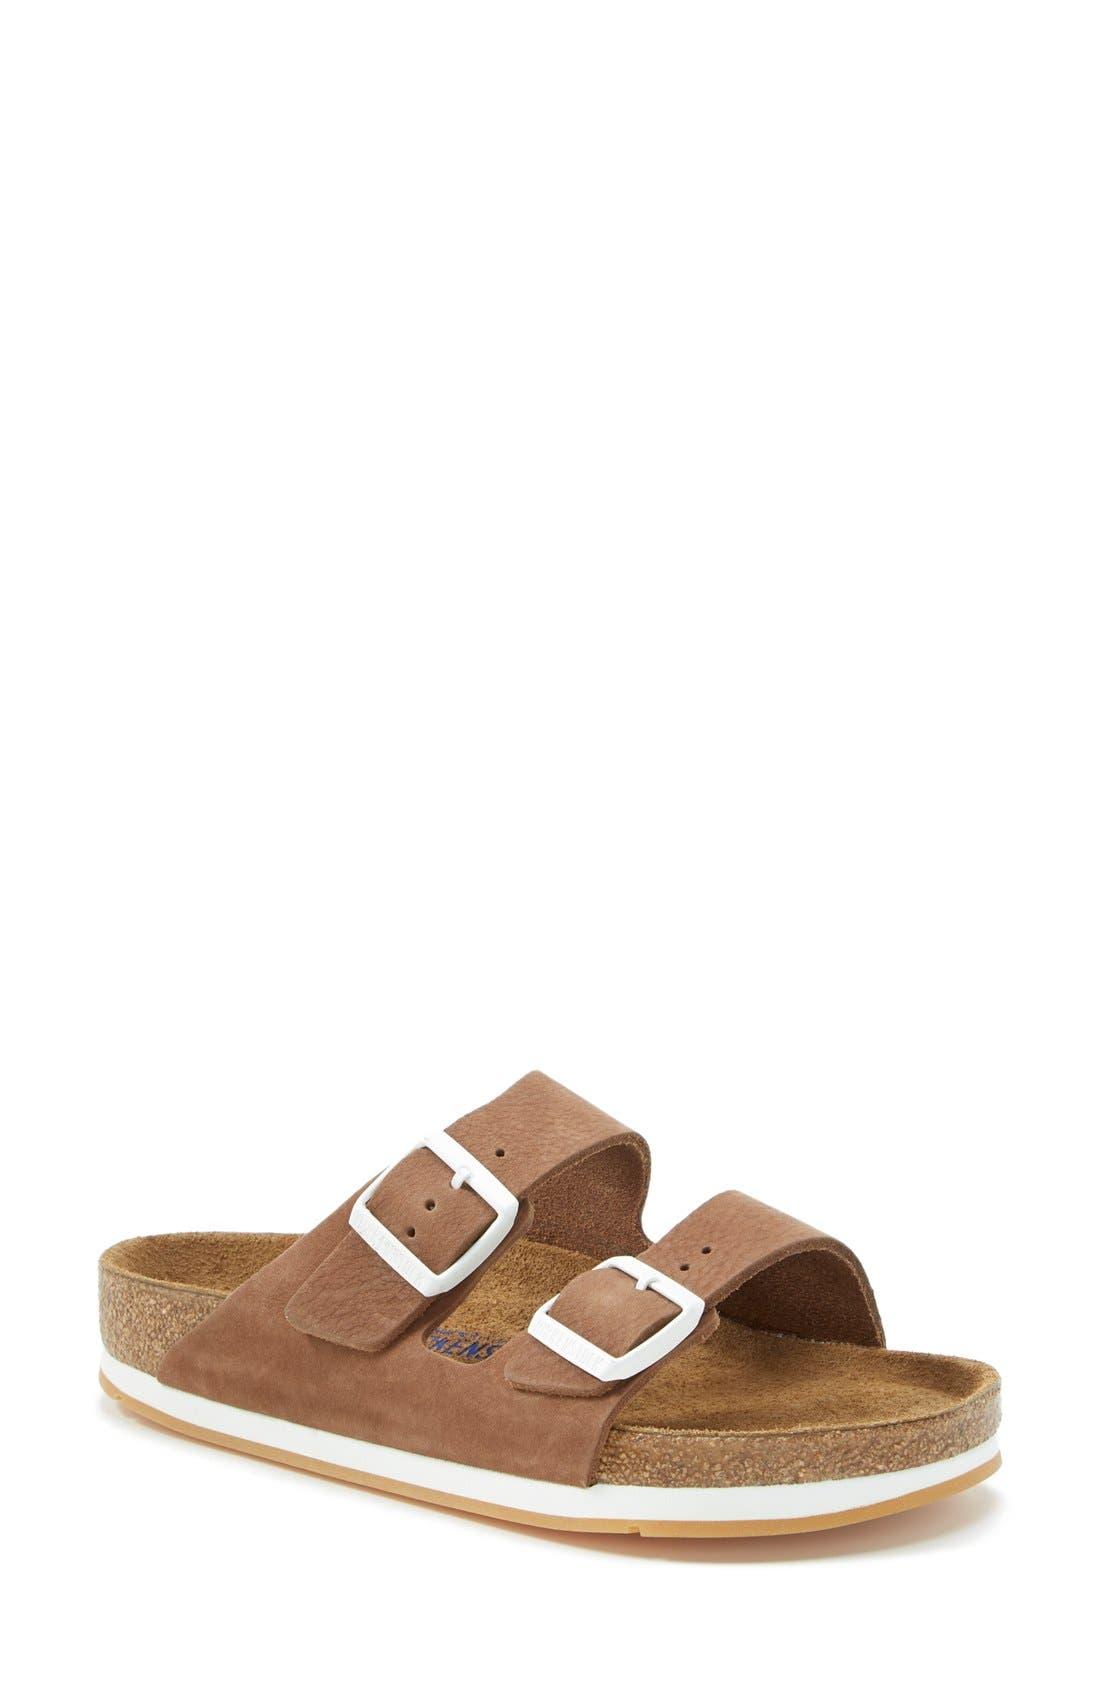 'Arizona' Soft Footbed Sandal,                             Main thumbnail 1, color,                             200